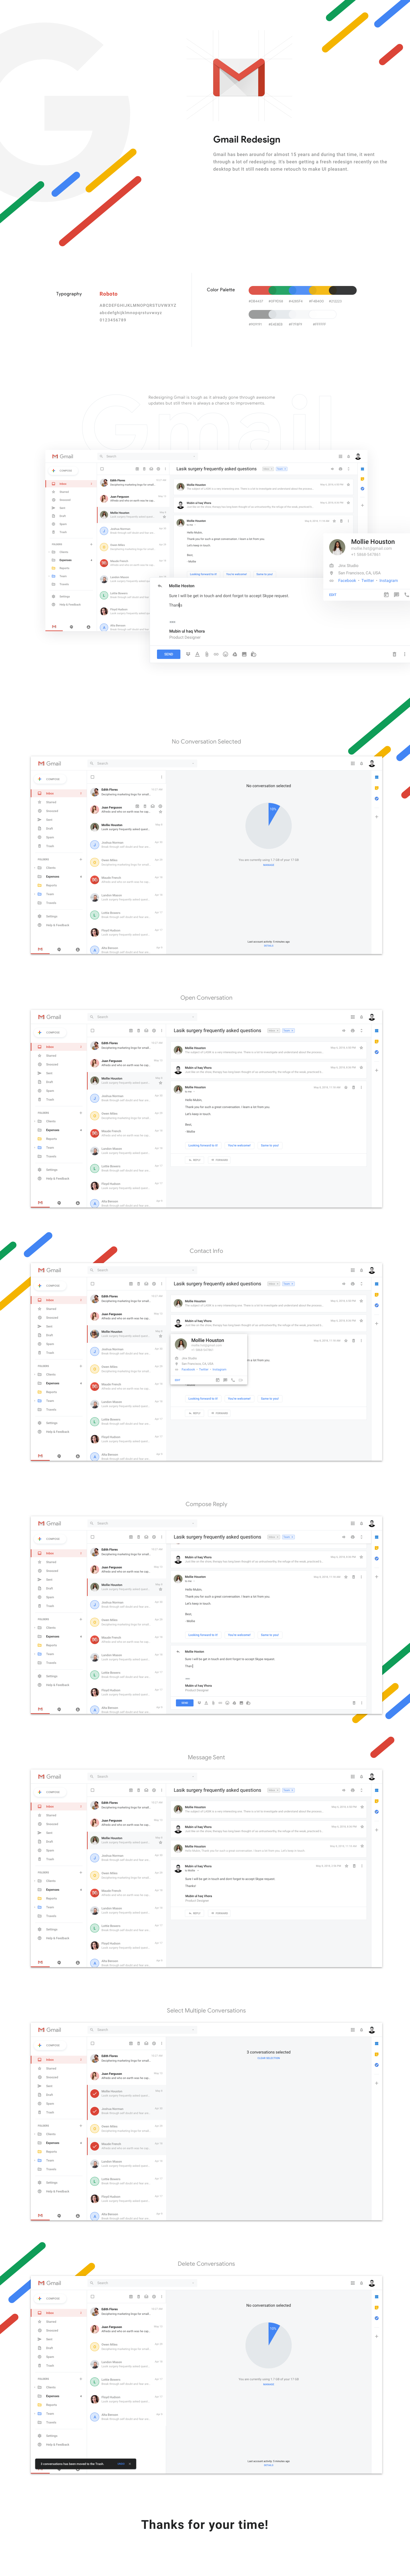 Gmail redesign presentation full